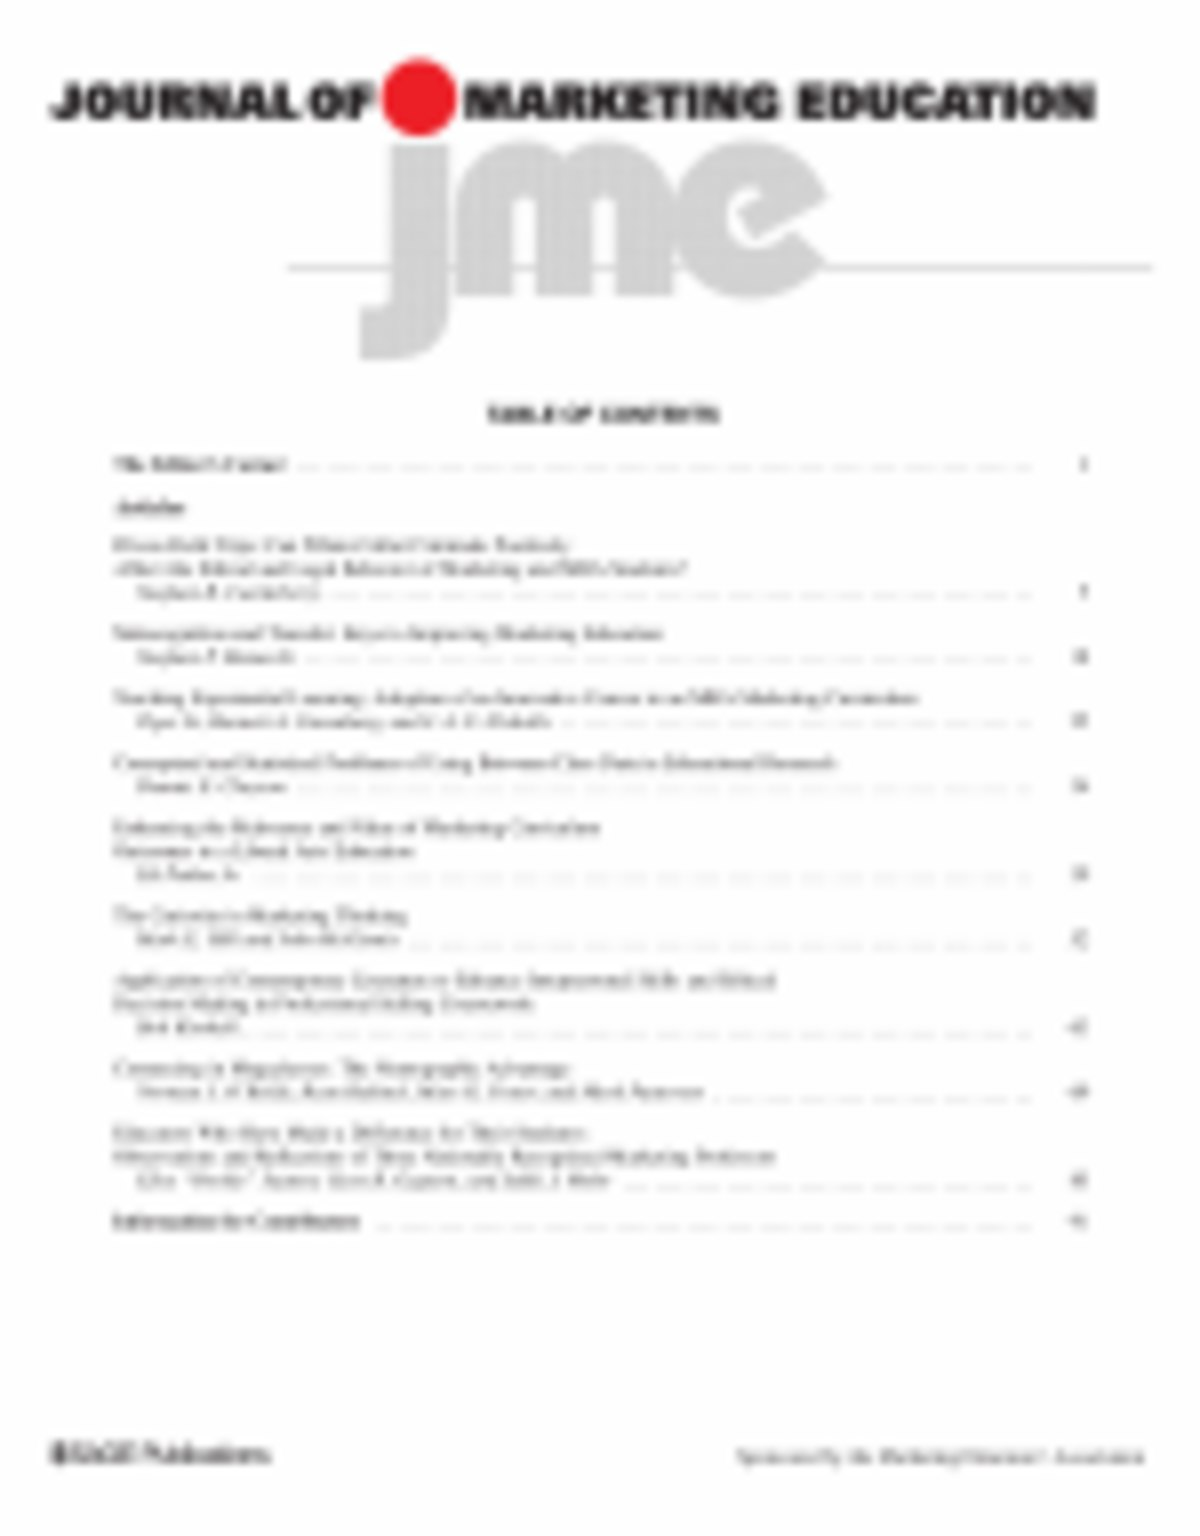 learning journal for marketing g Journal of marketing management, 20(1–2), 67  market information processing and organizational learning journal of marketing, 58(1), 35 .